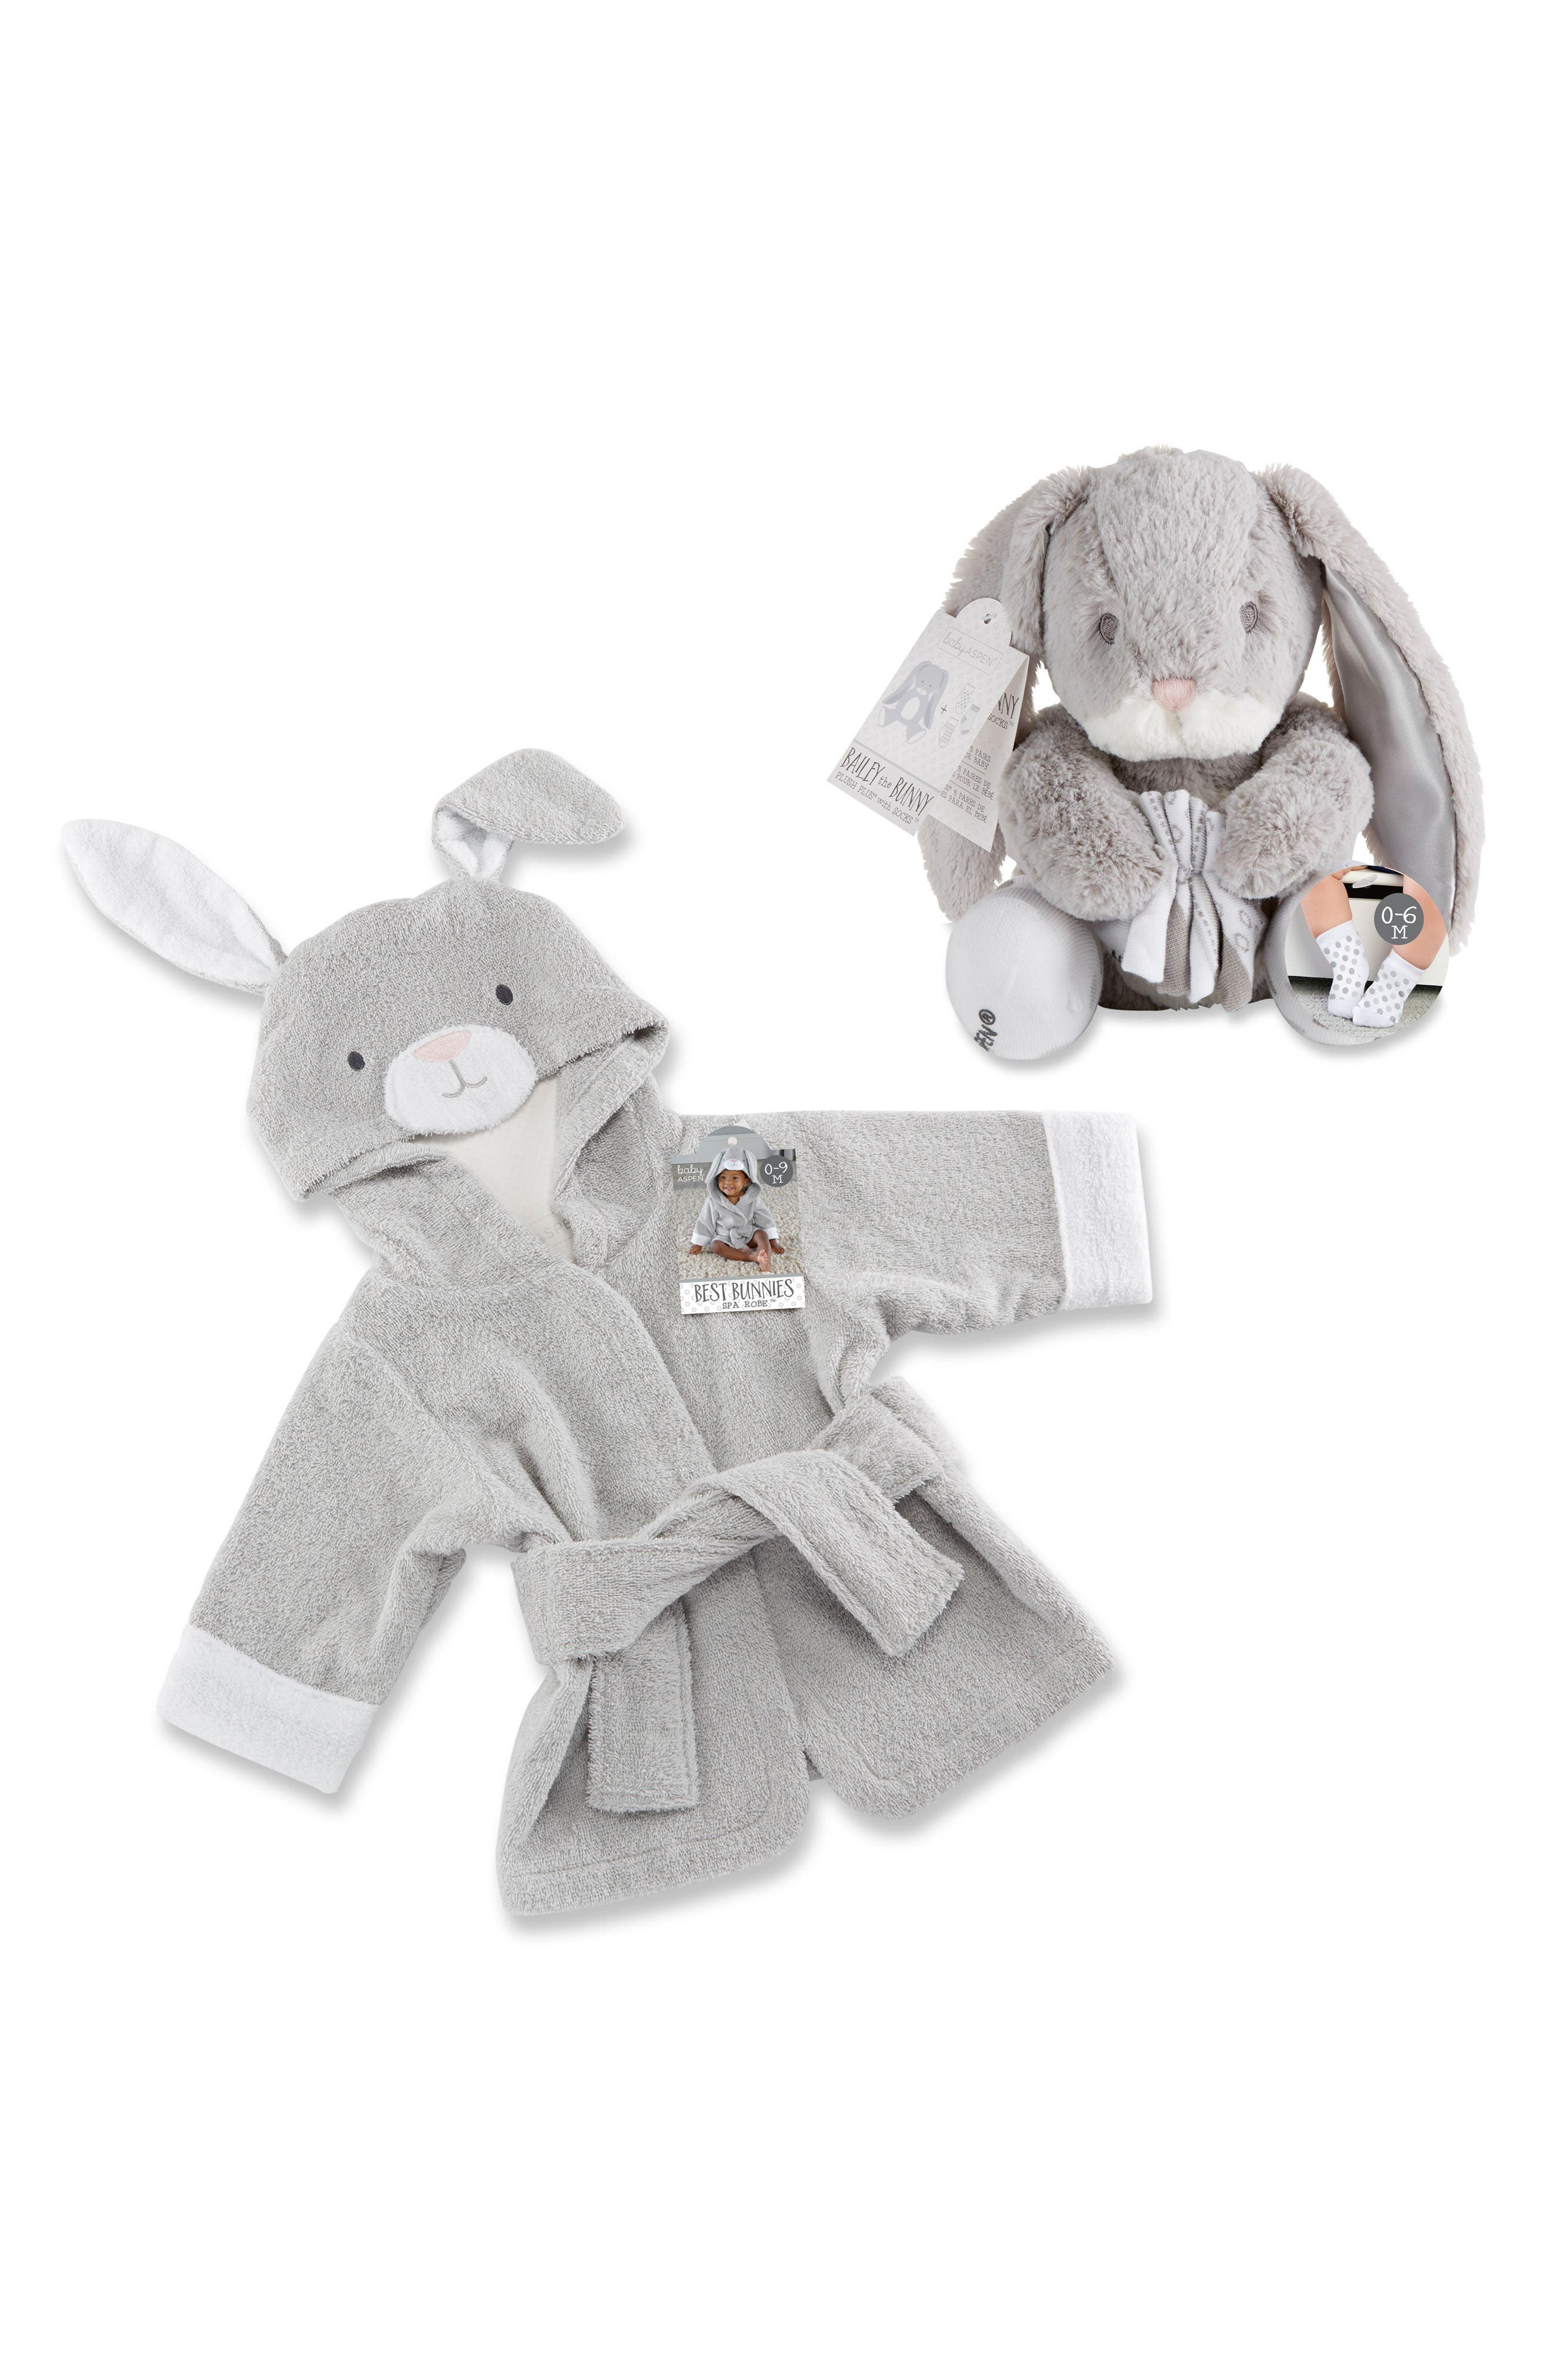 Bunnie Hooded Robe & Stuffed Animal,                         Main,                         color, GRAY